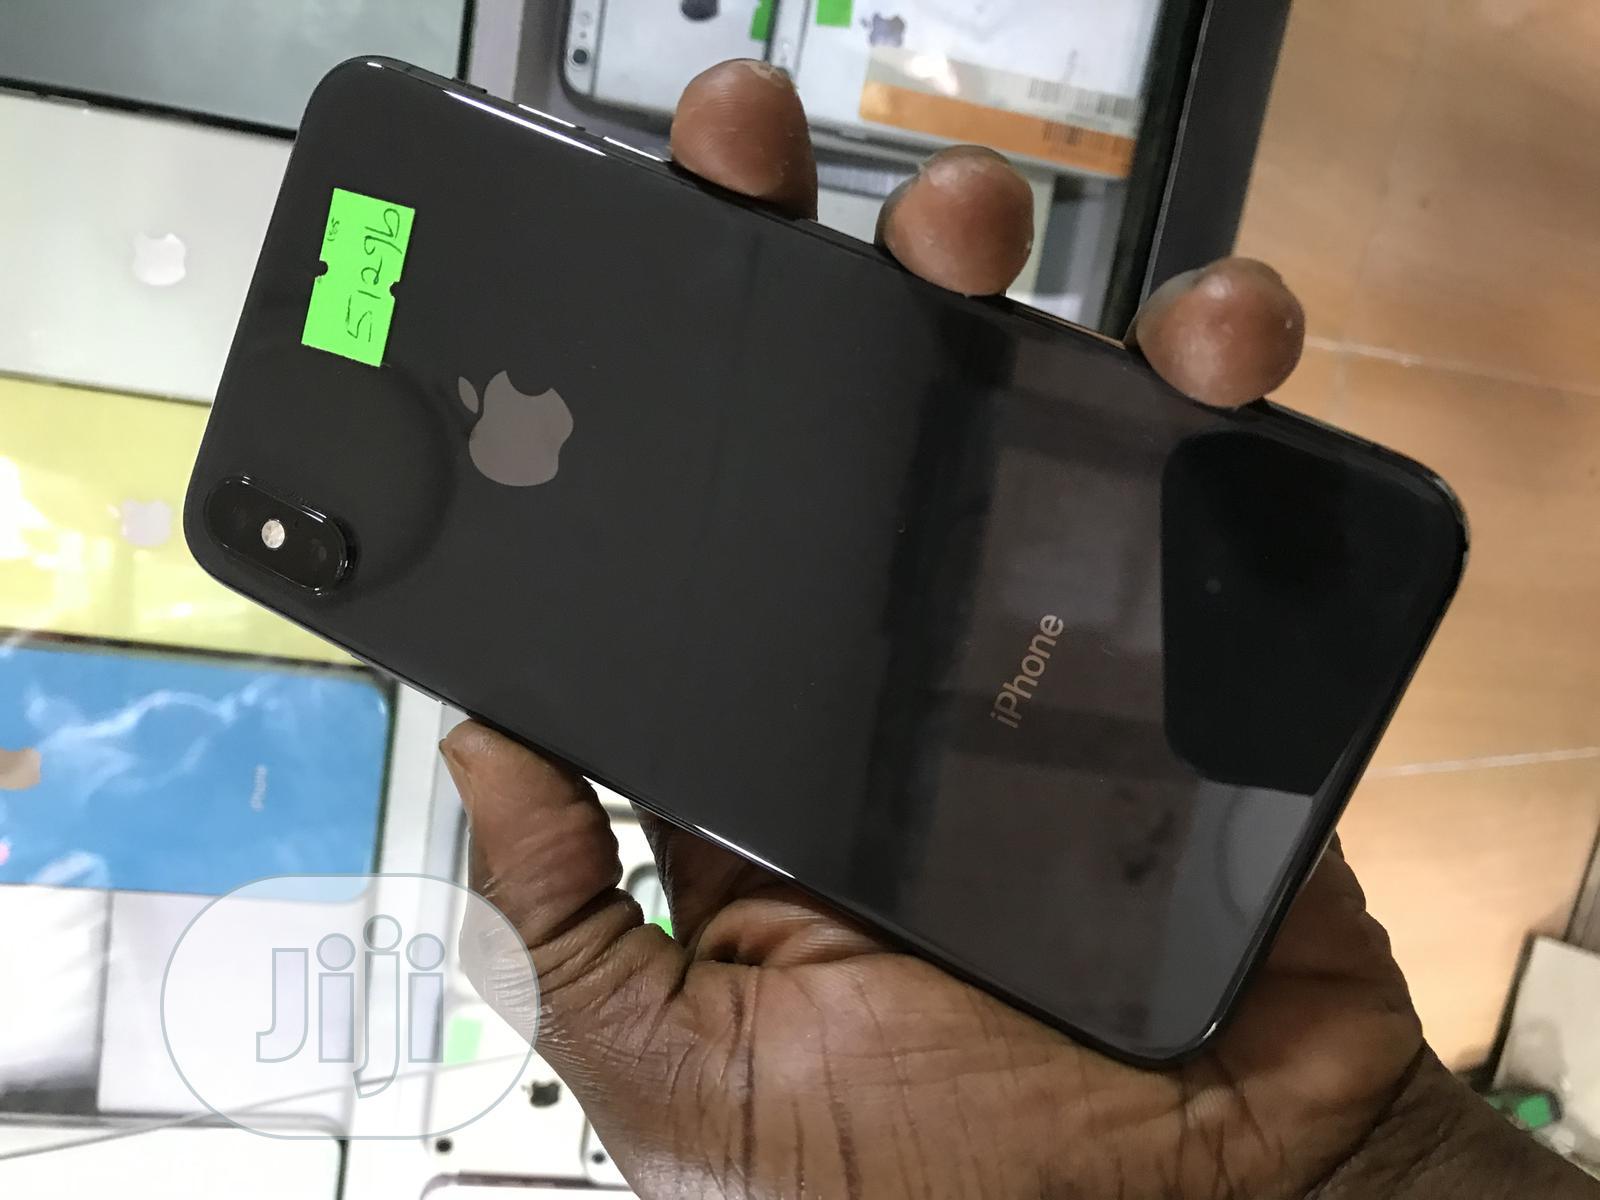 Apple iPhone XS Max 512 GB Black | Mobile Phones for sale in Ikeja, Lagos State, Nigeria